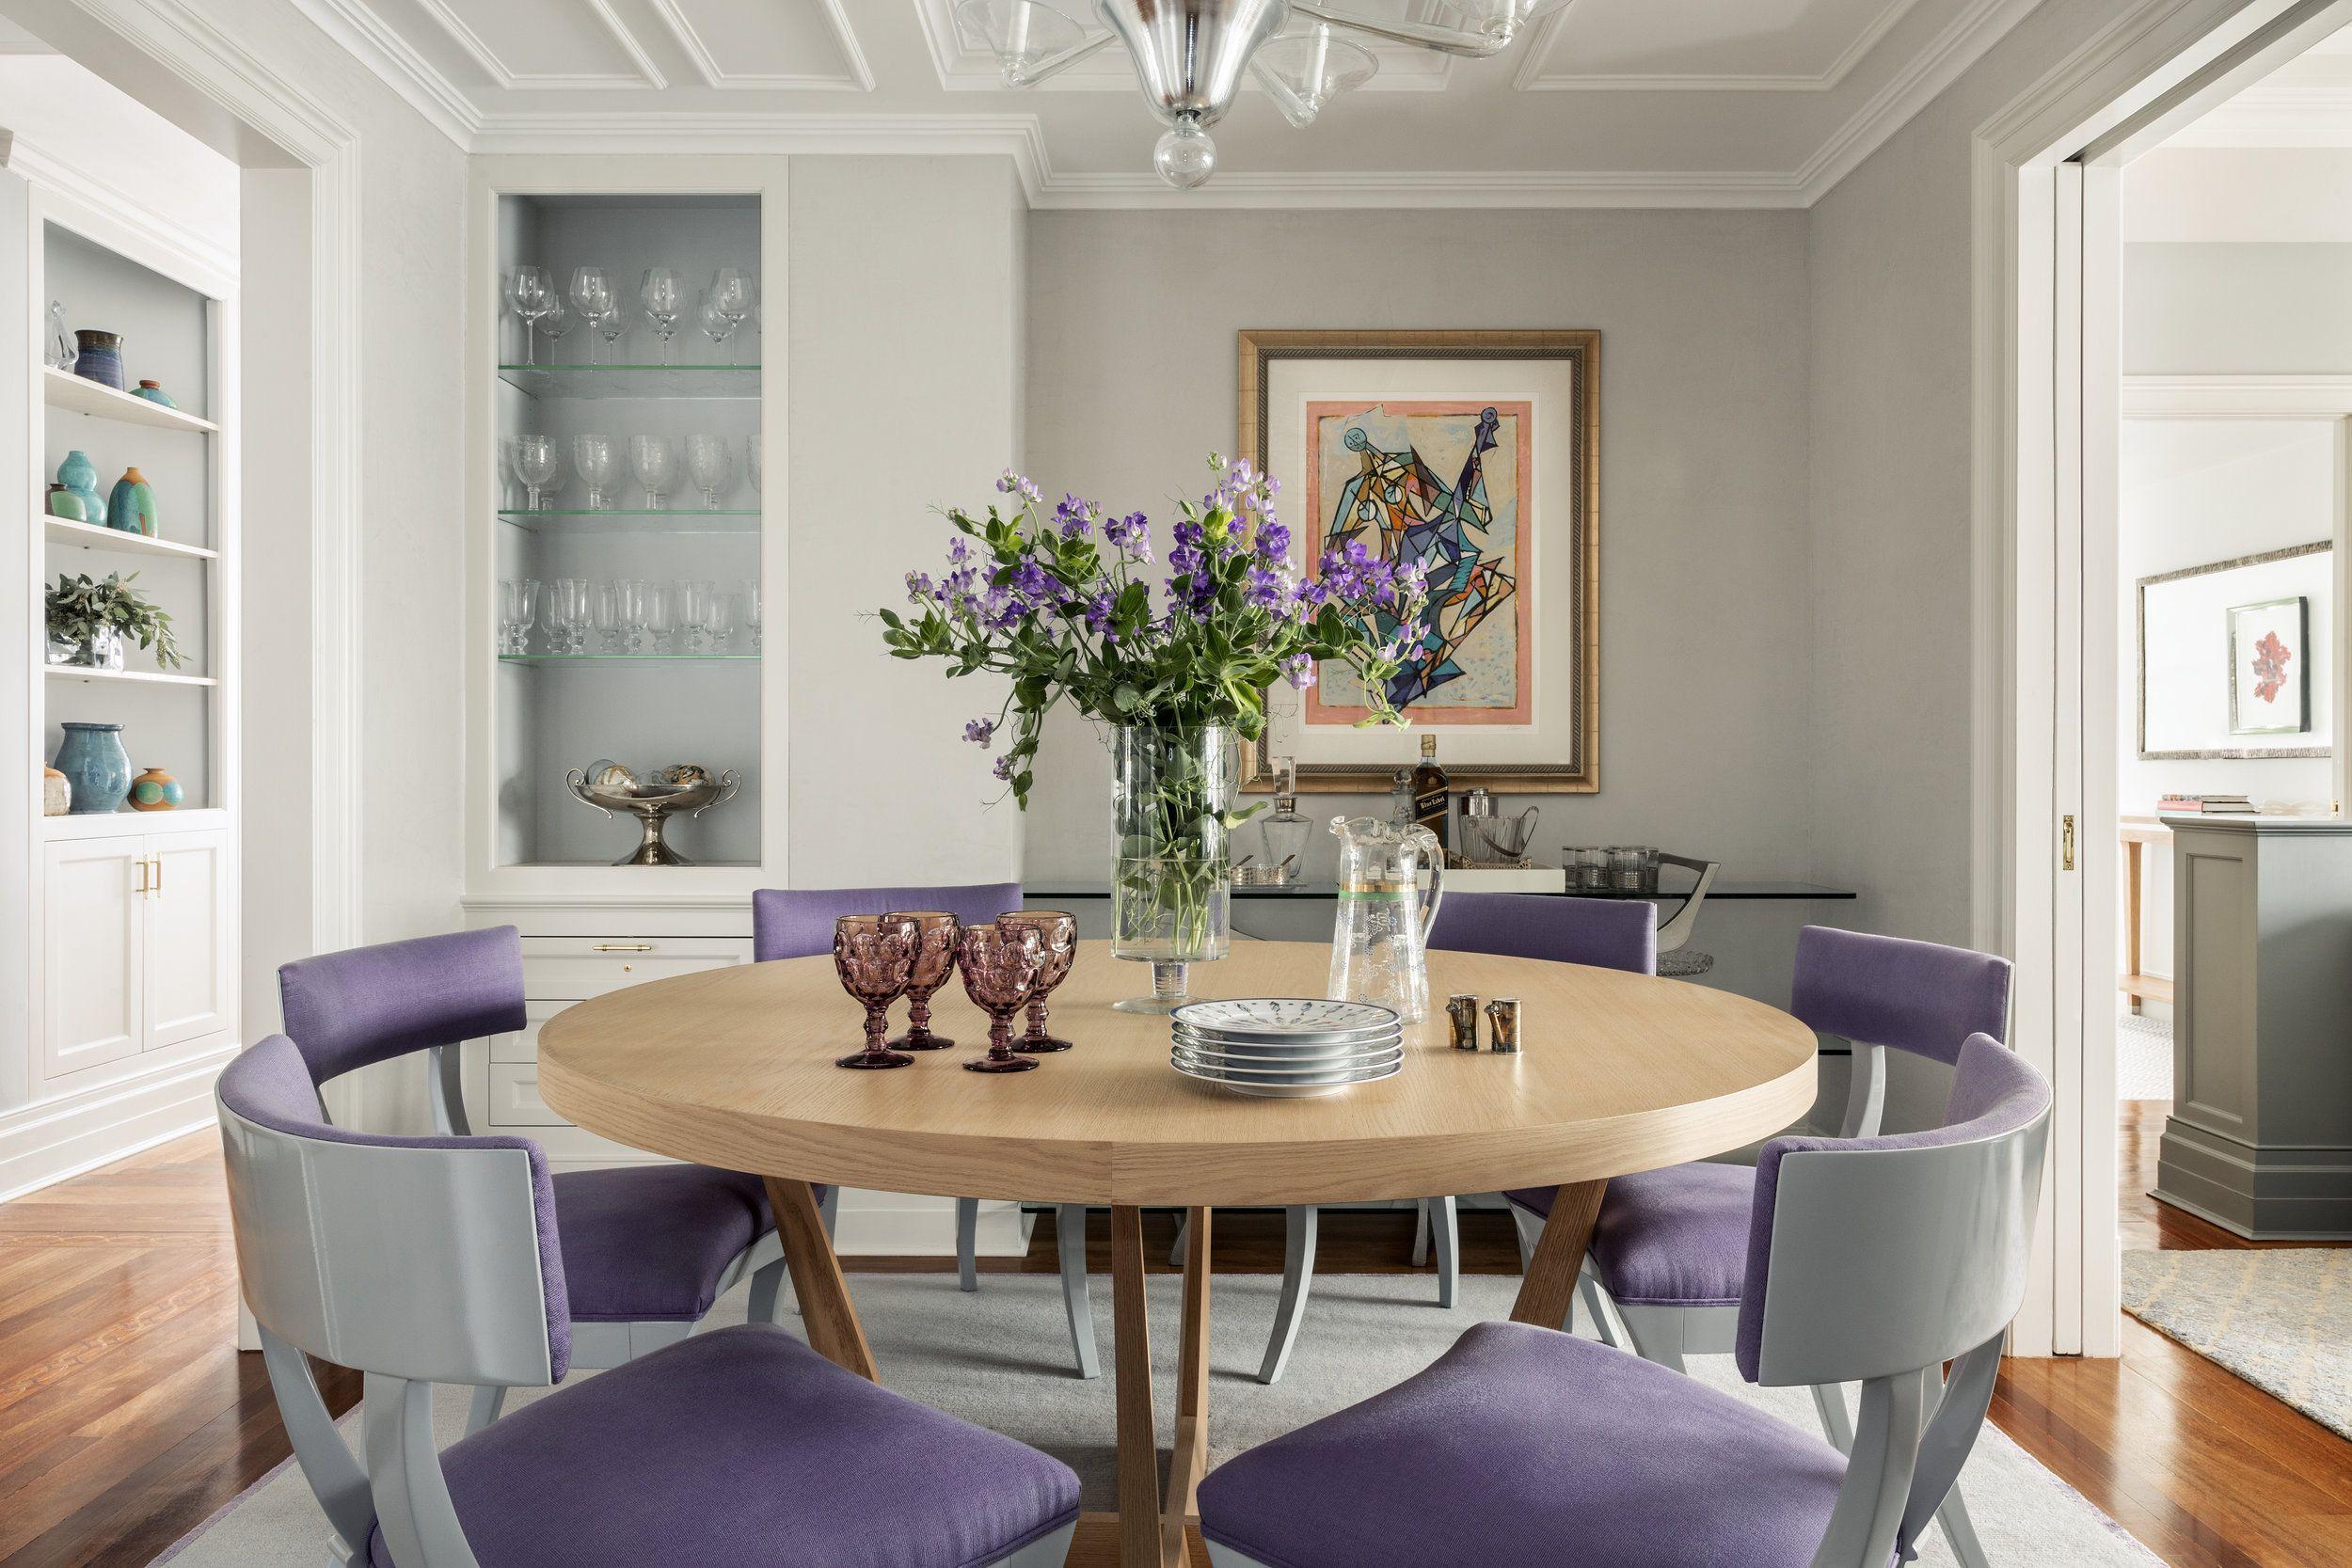 _M7A8346.jpg Lavender room, Interior, Design home app